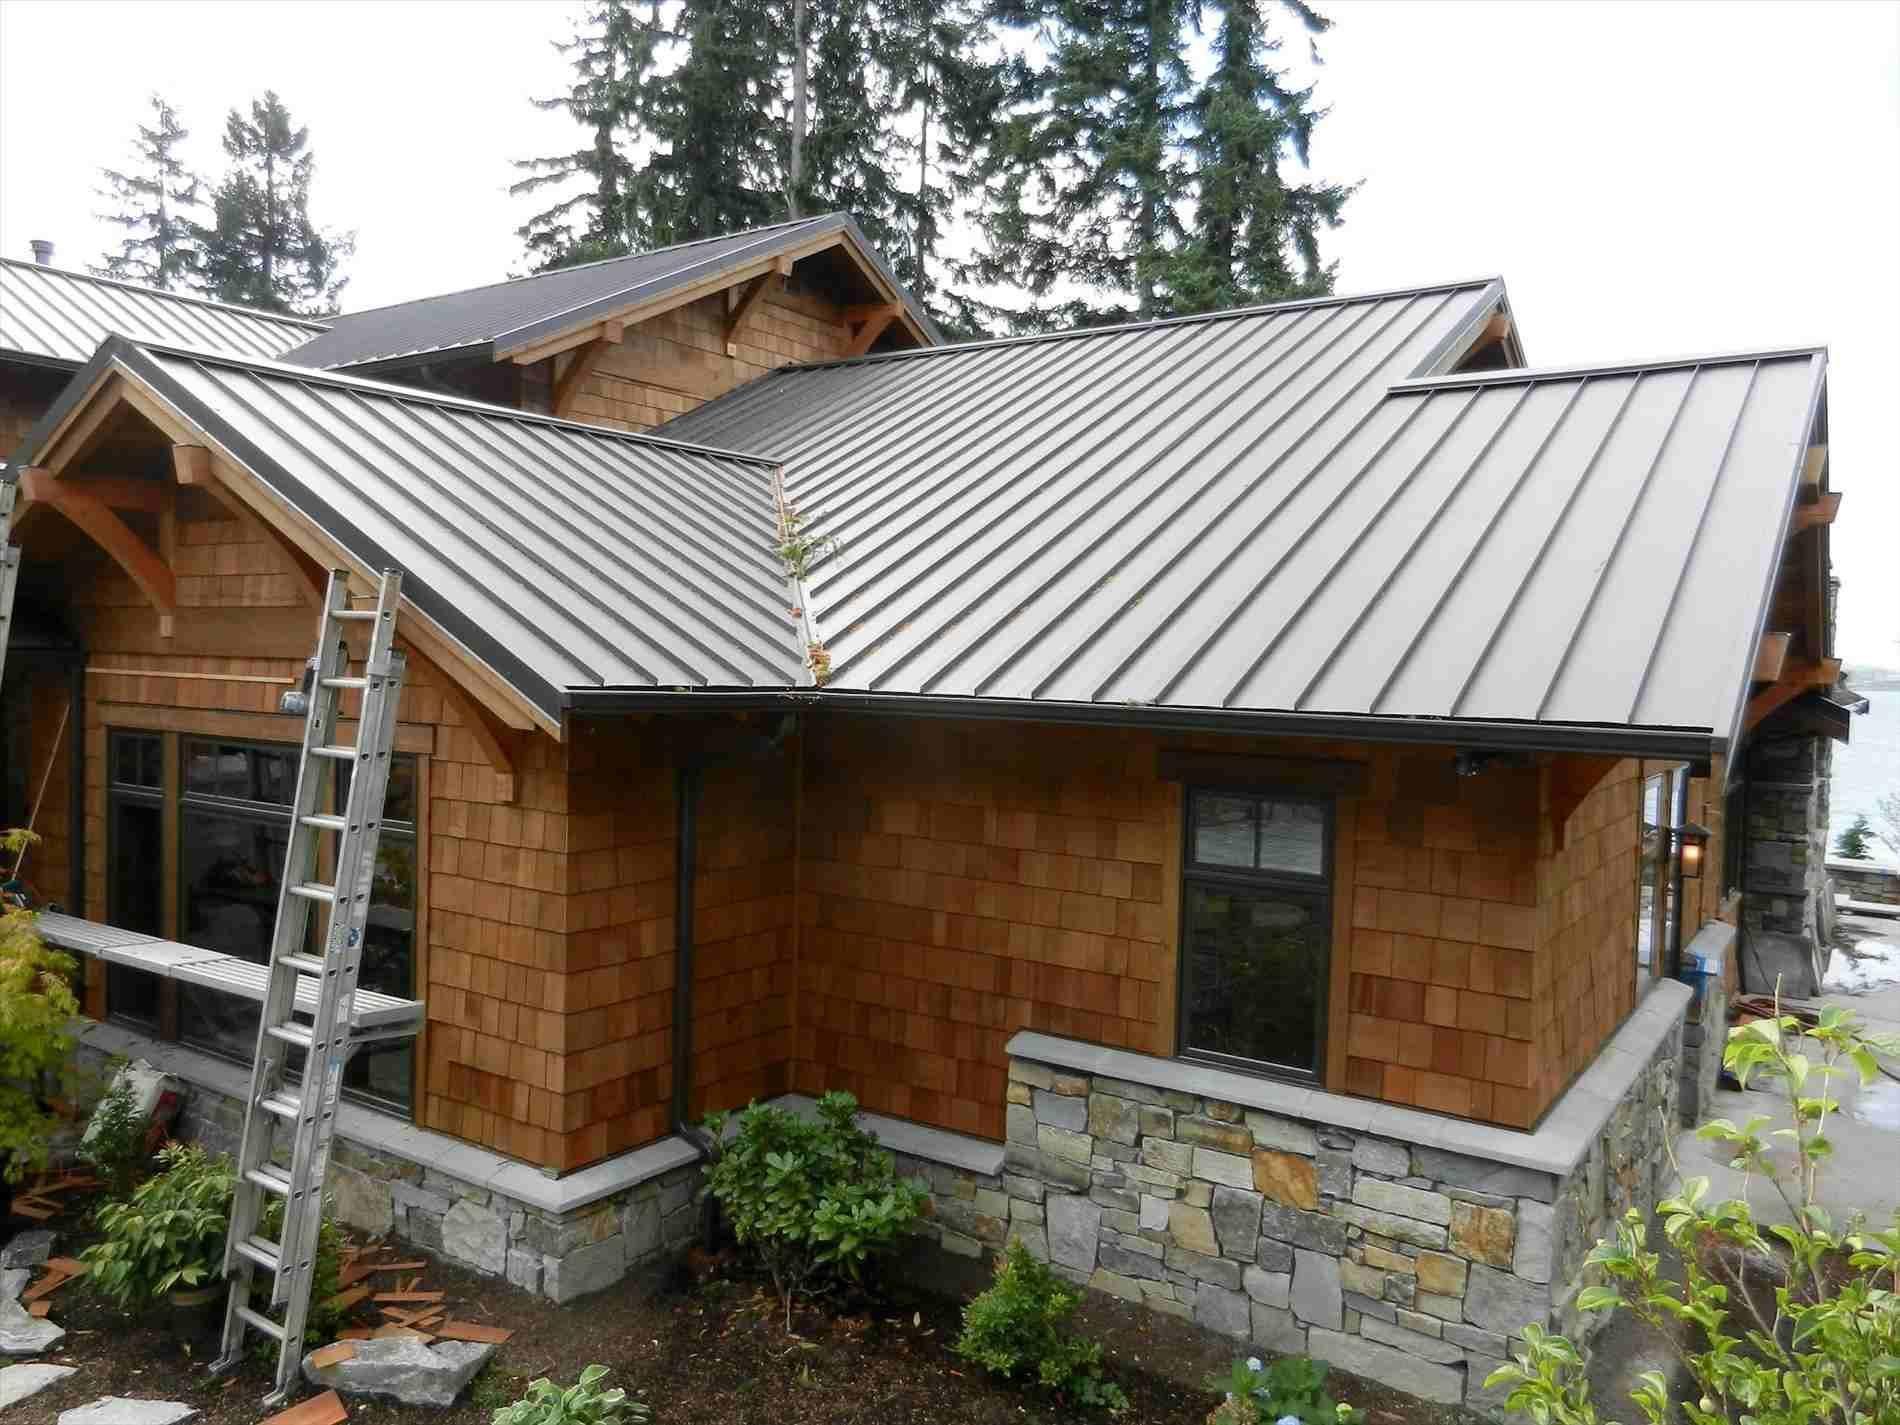 Bobayule Com Bobayule On Budget Ideas Metal Roof Houses Metal Roof Colors House Roof